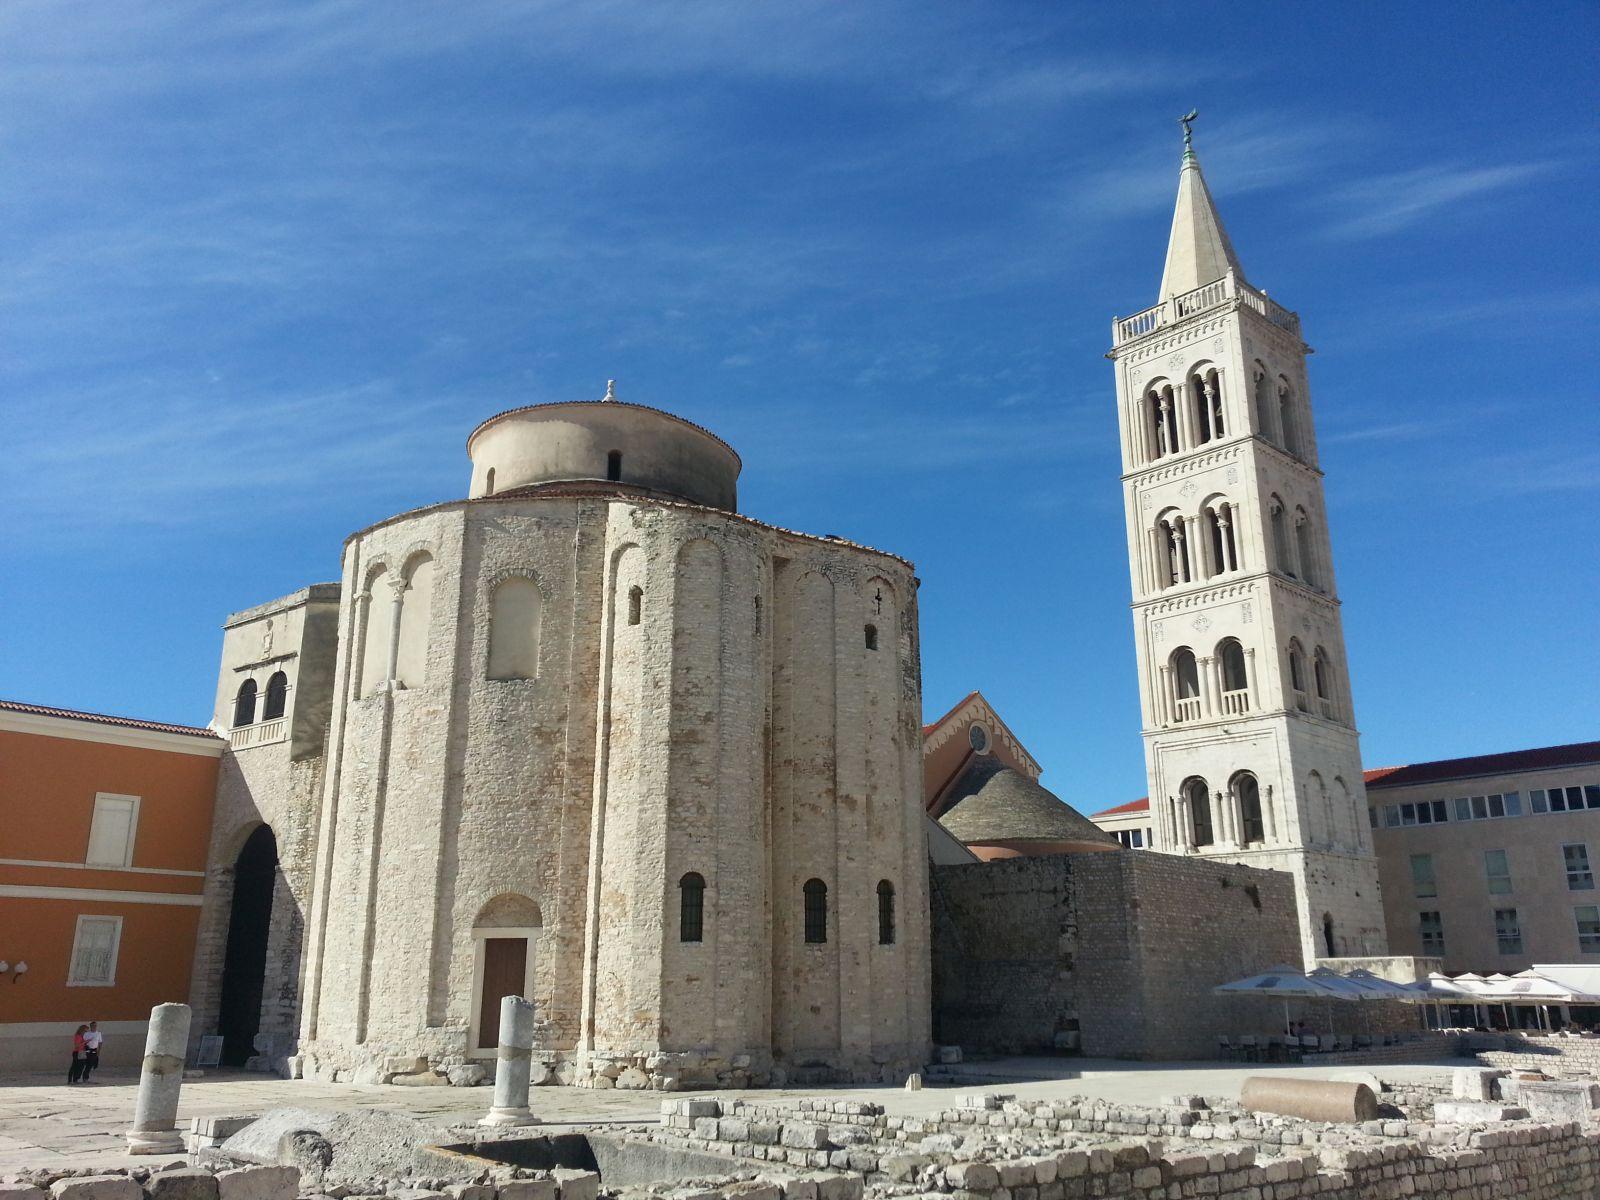 Najbolje od srednje i sjeverne Dalmacije: Zadar: sv. Donat i katedrala